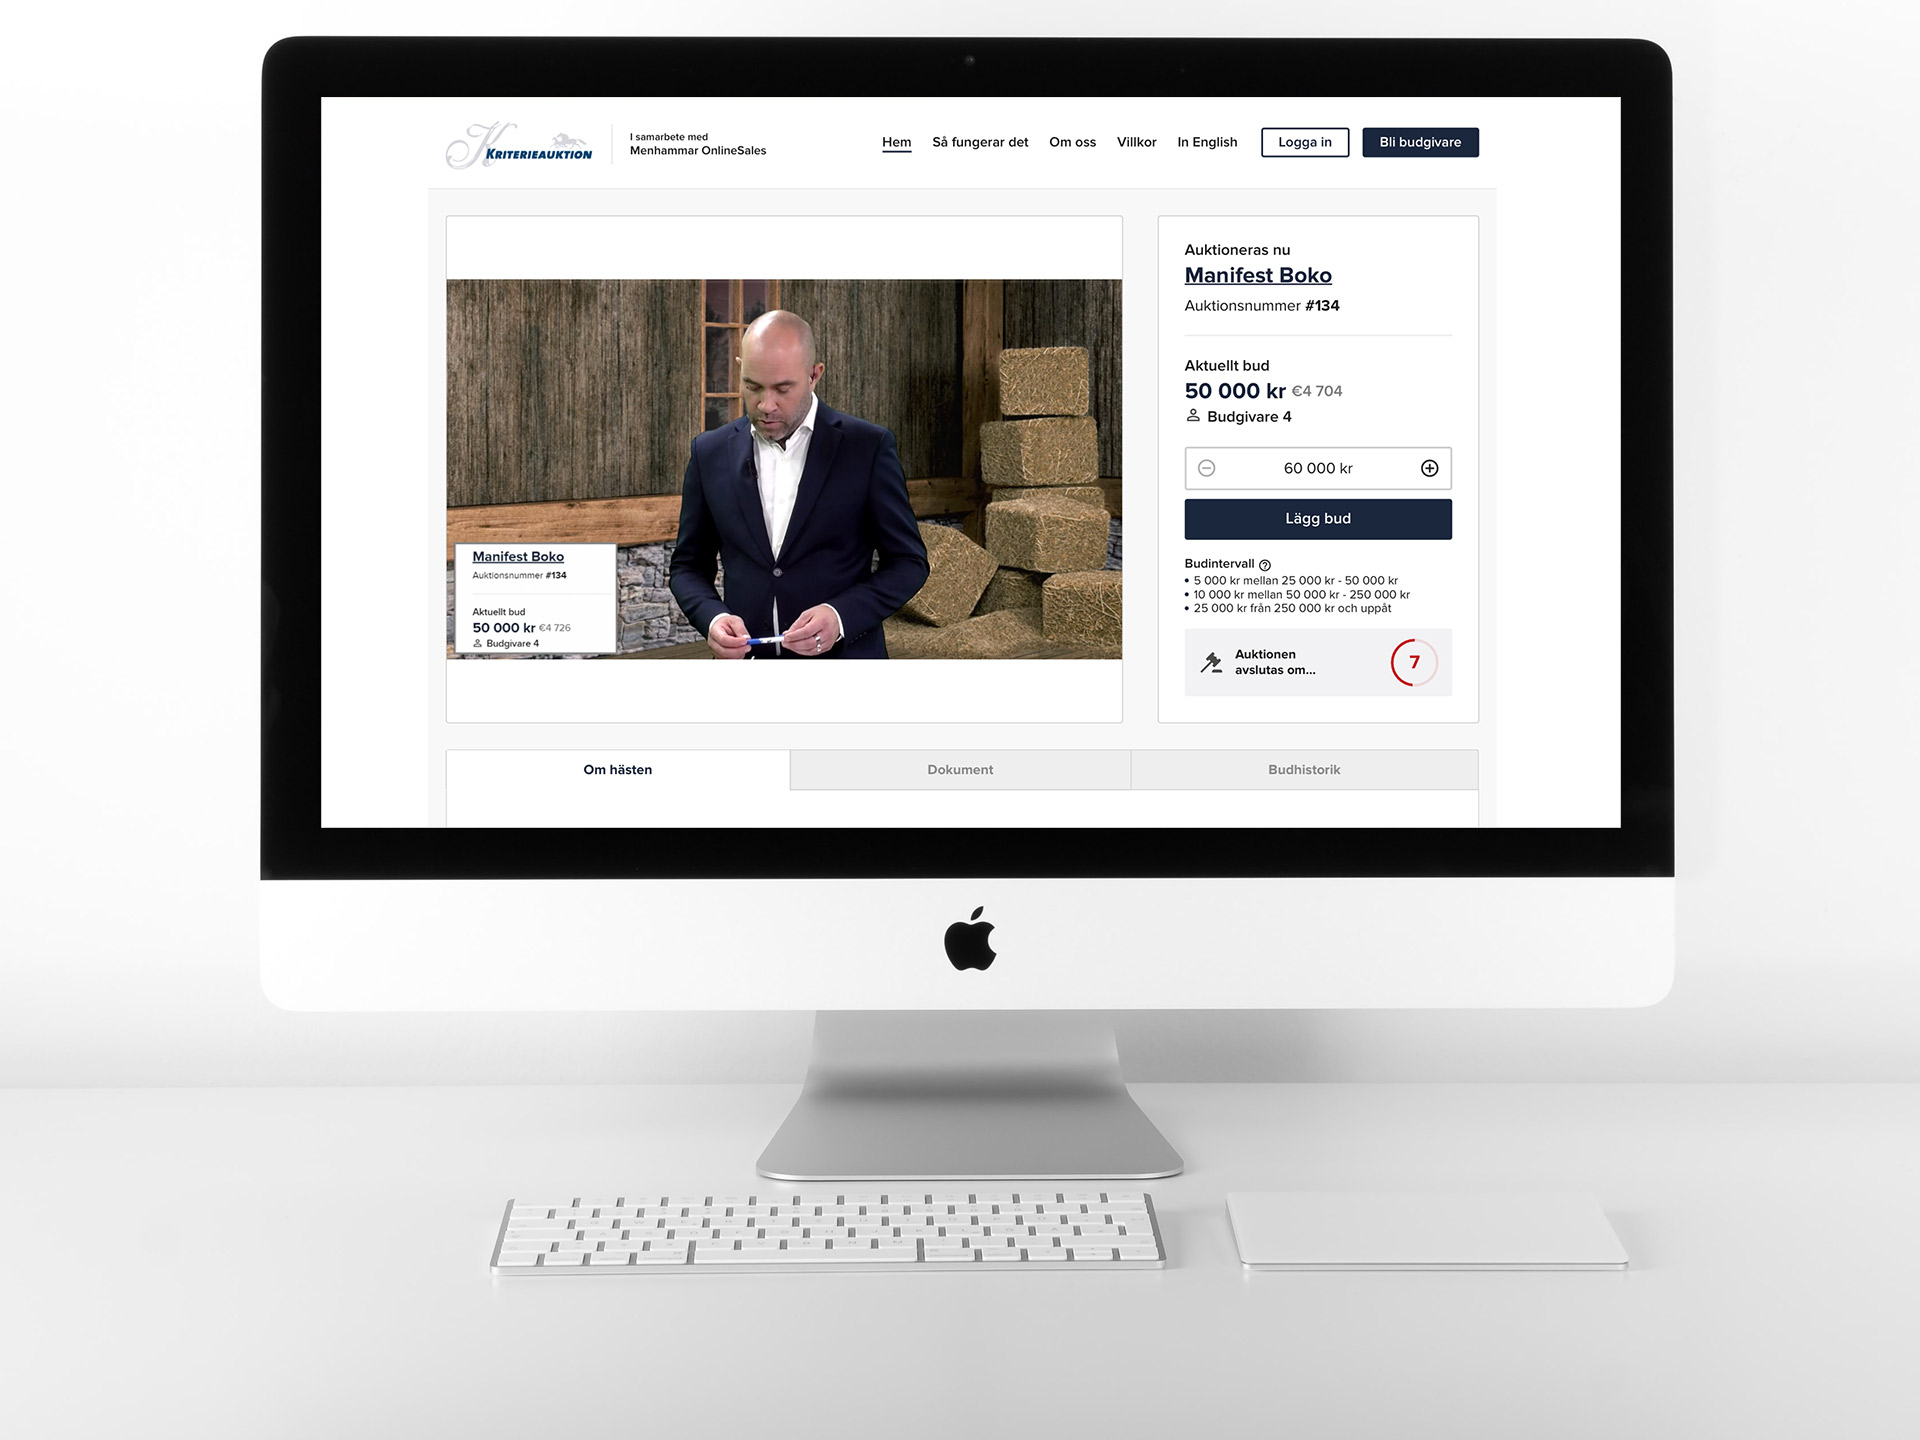 Menhammar Online Sales produced by Streamrocket AB